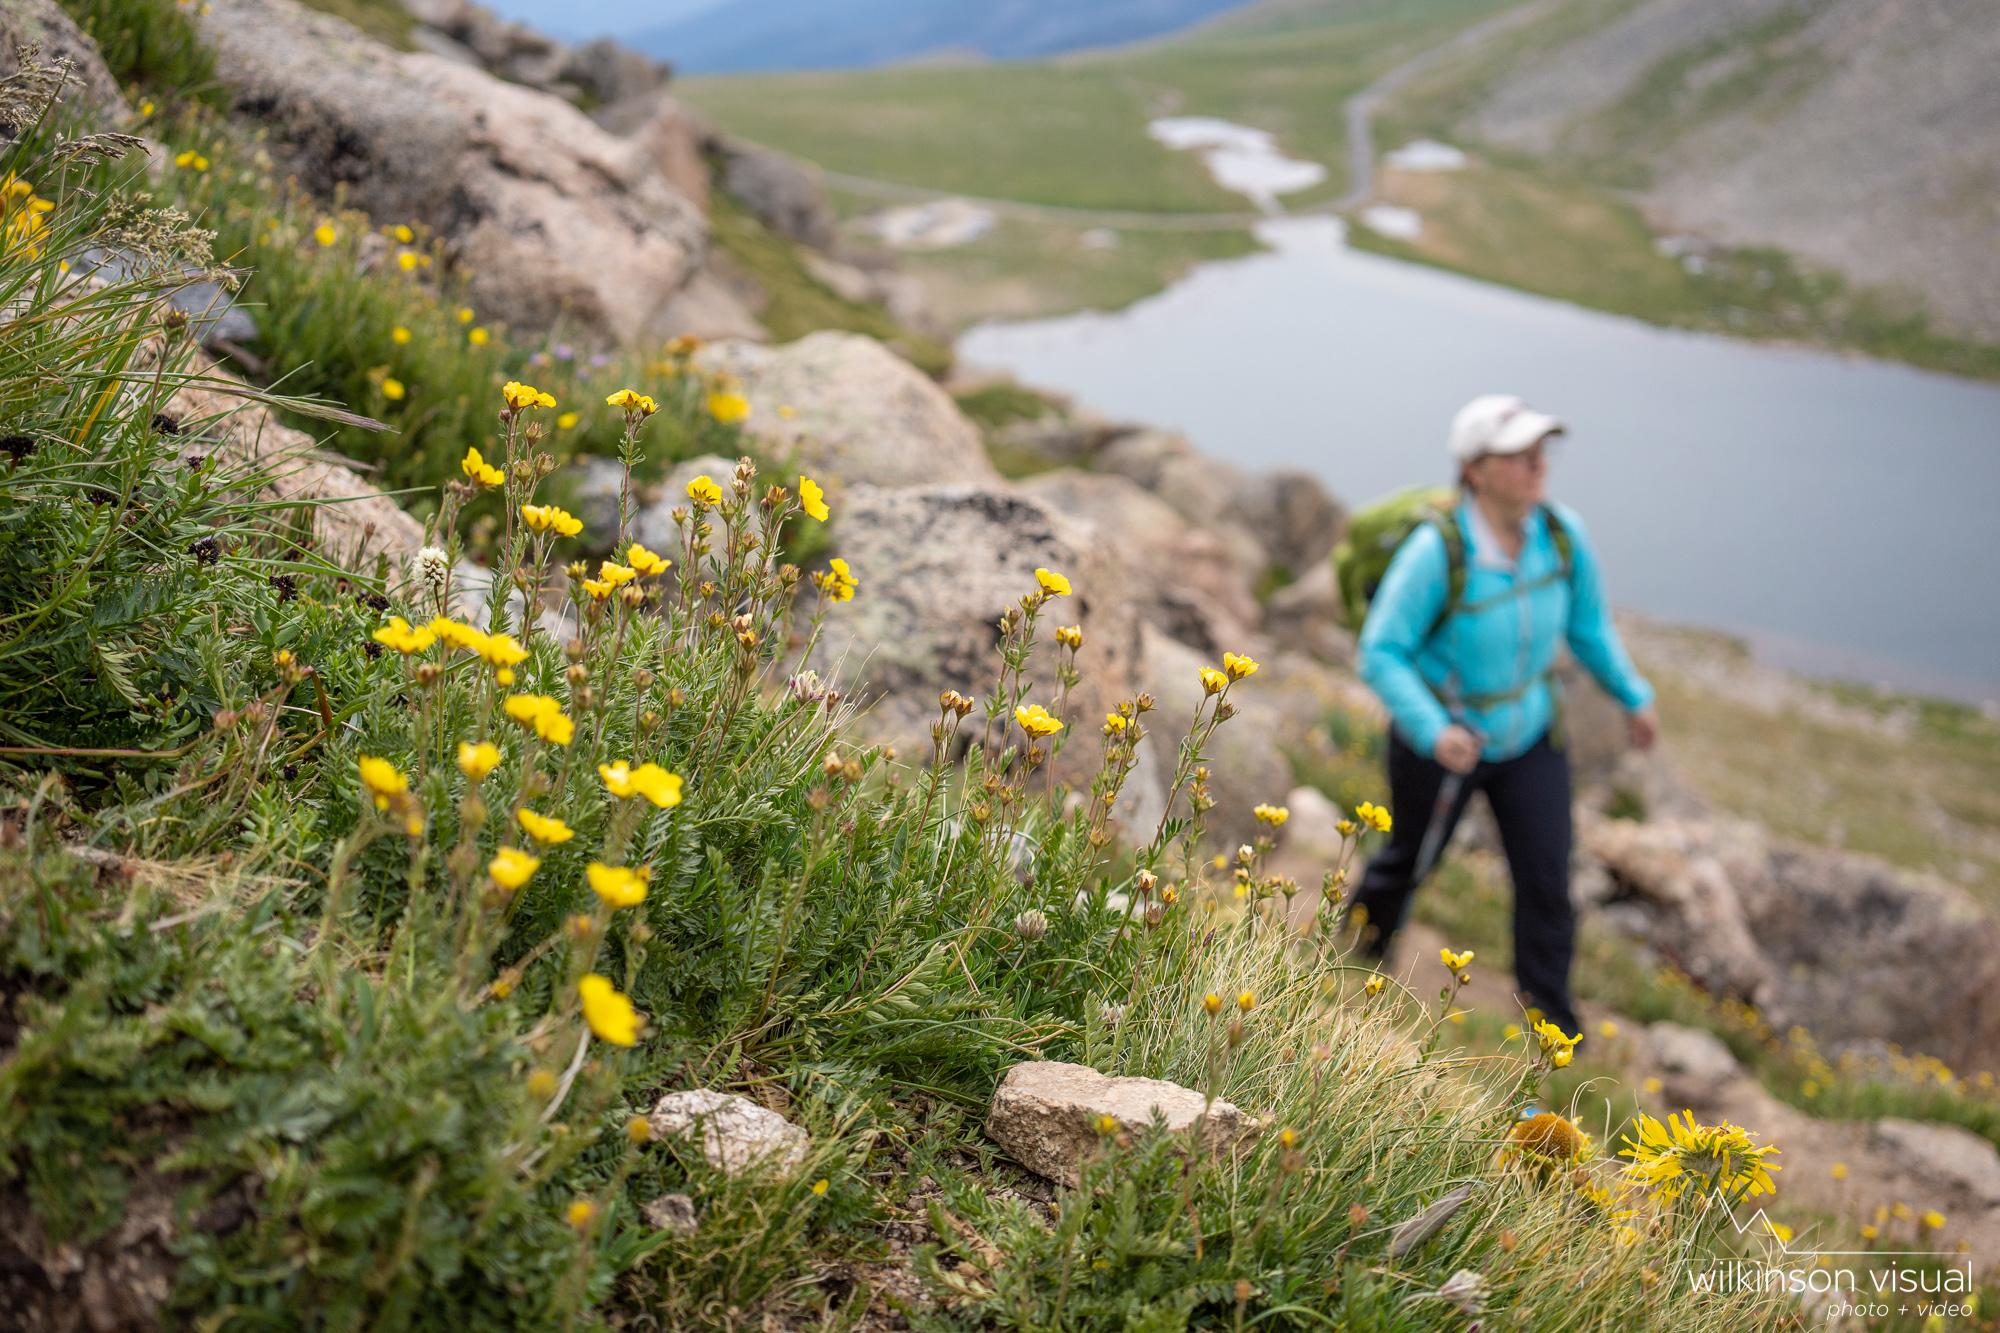 Jen Meunier hikes near Mt. Evans, Colorado.